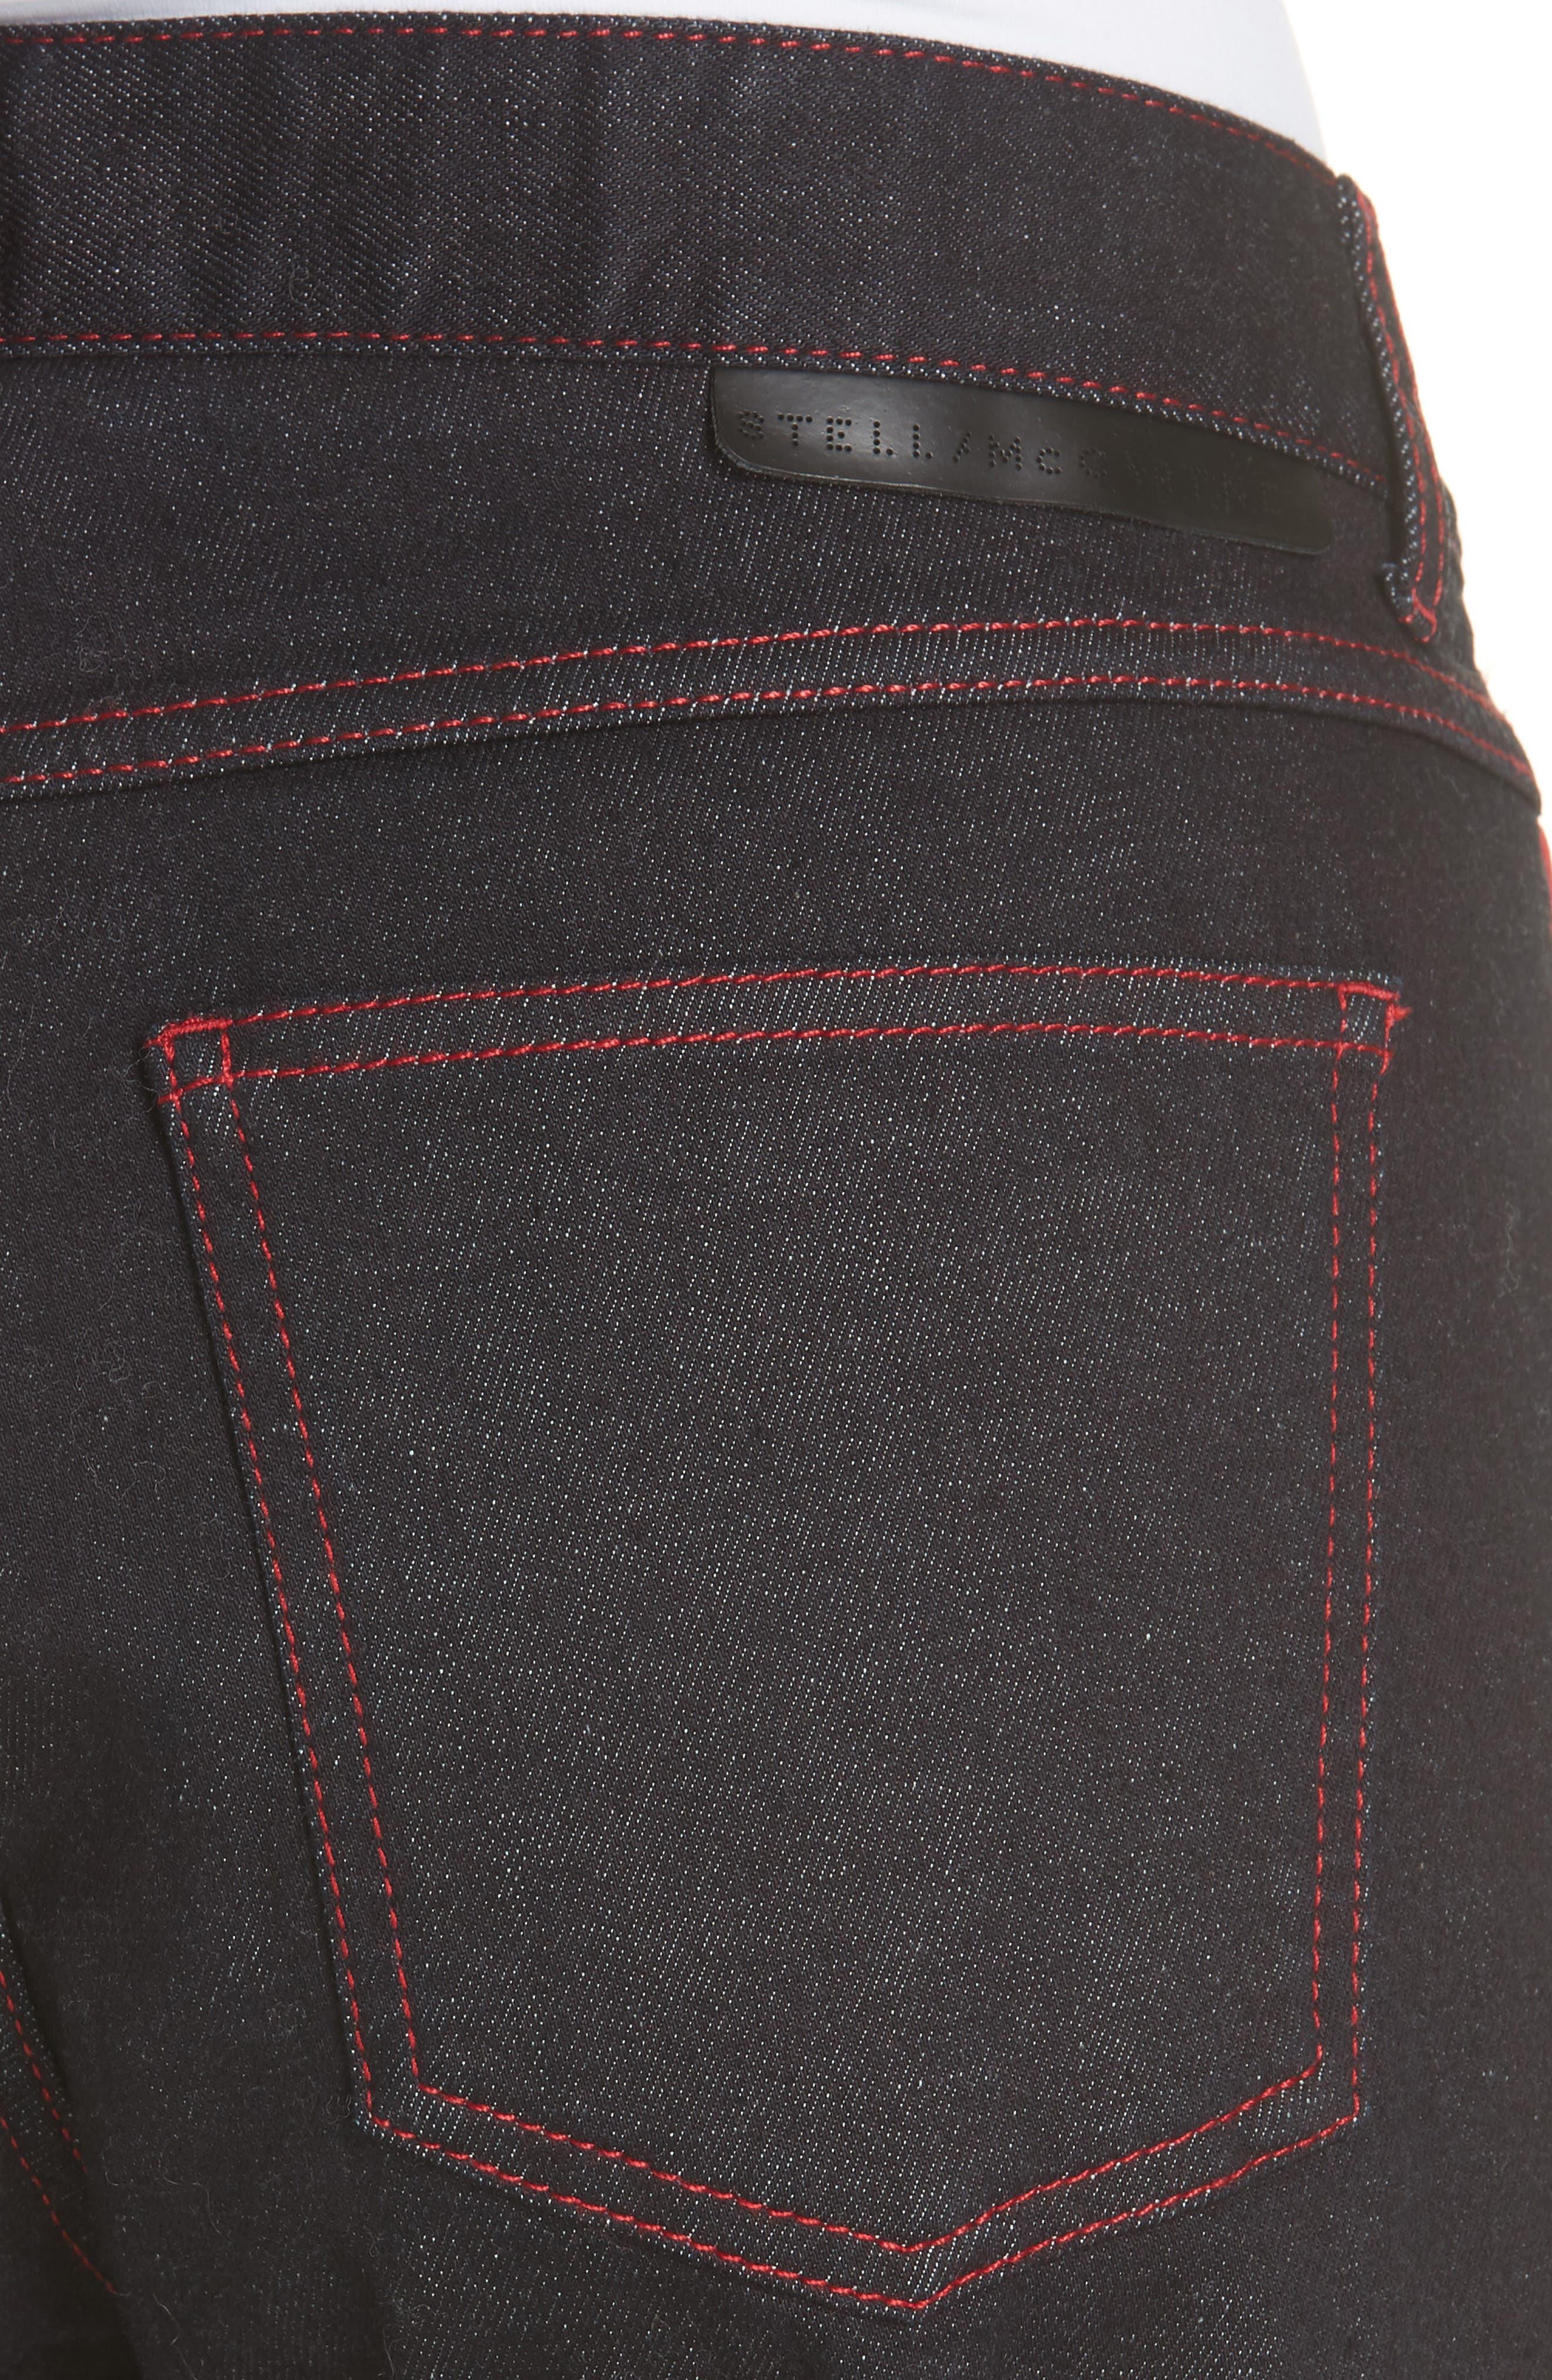 Red Piping Raw Denim Skinny Boyfriend Jeans,                             Alternate thumbnail 4, color,                             403